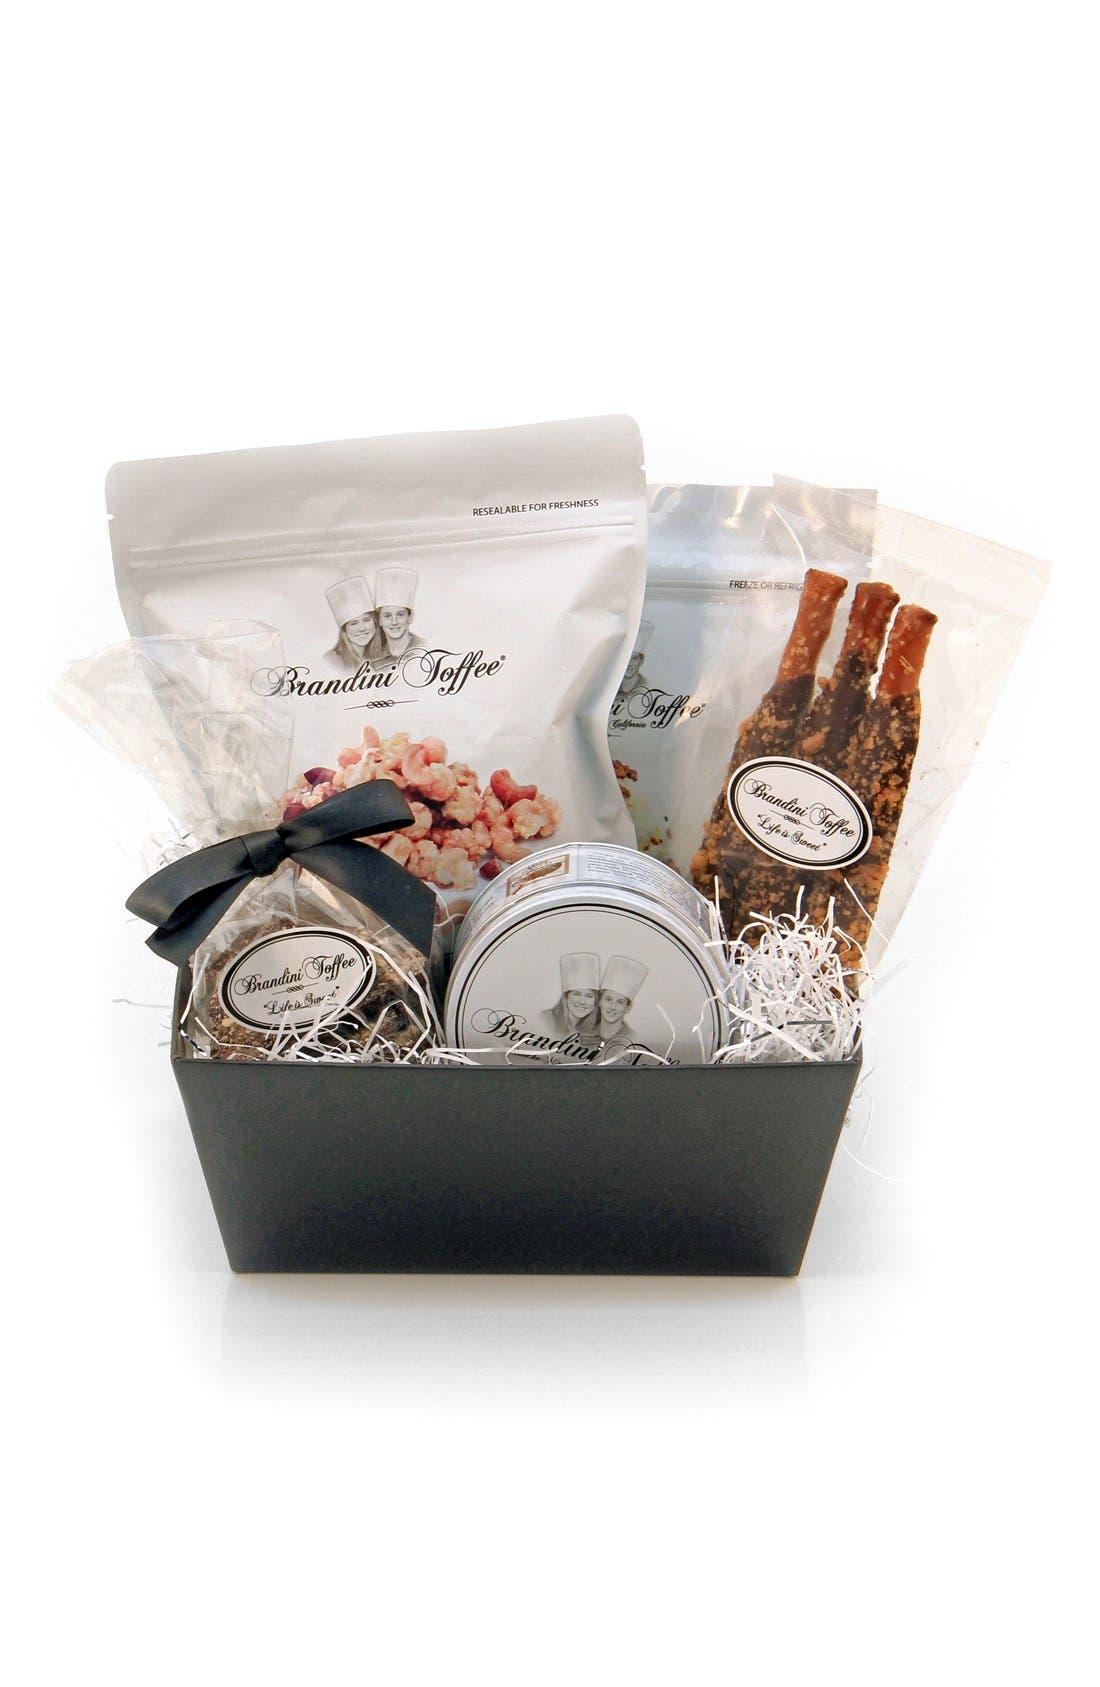 Brandini Toffee Small Gift Basket